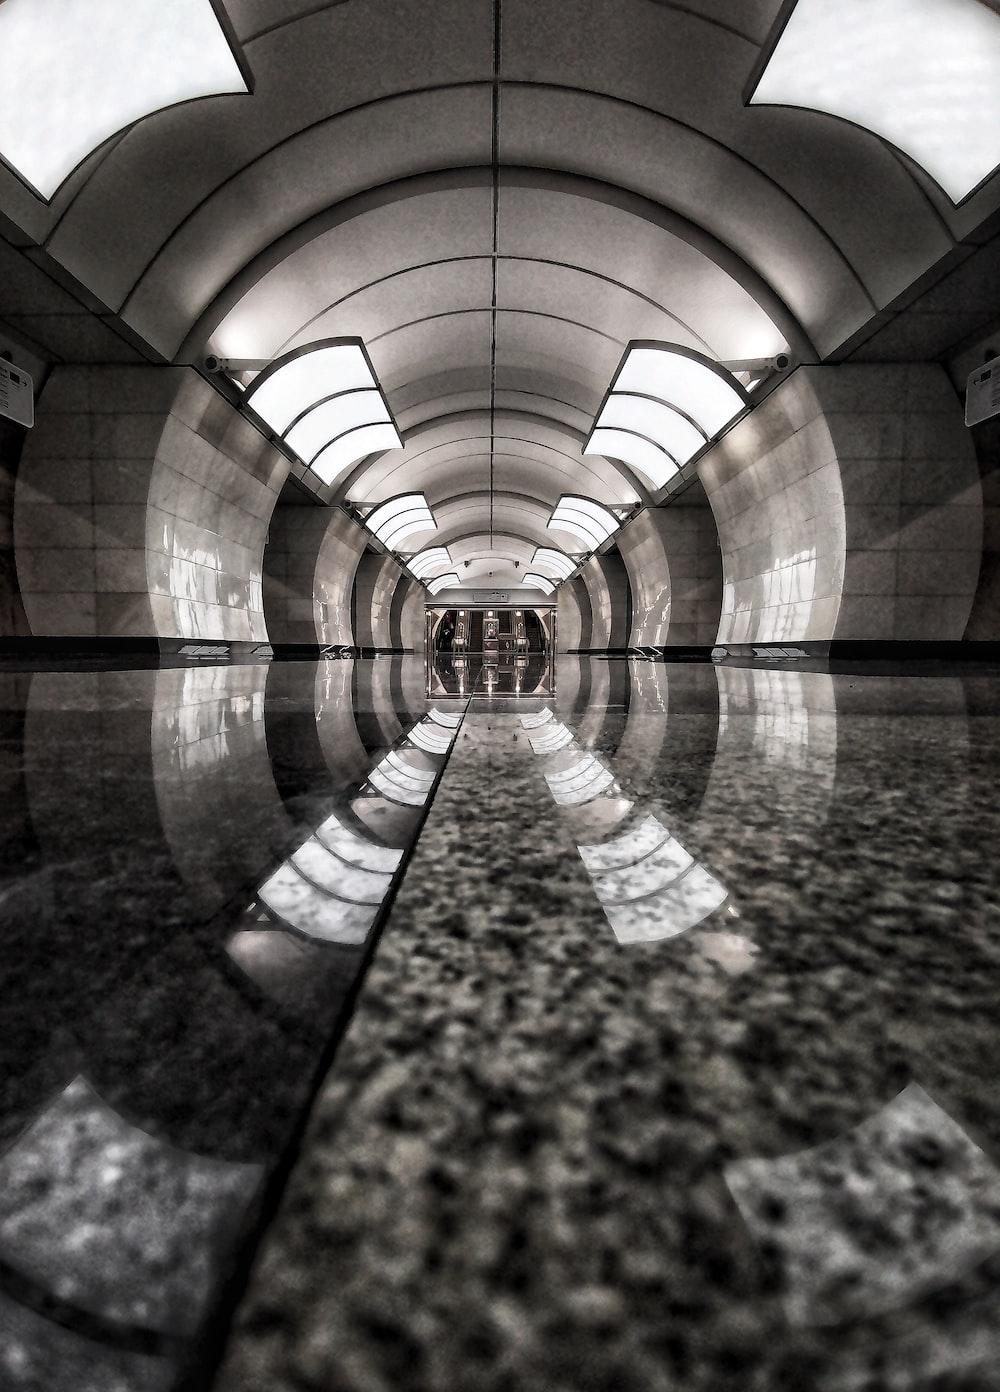 reflection of light in granite texture flooring